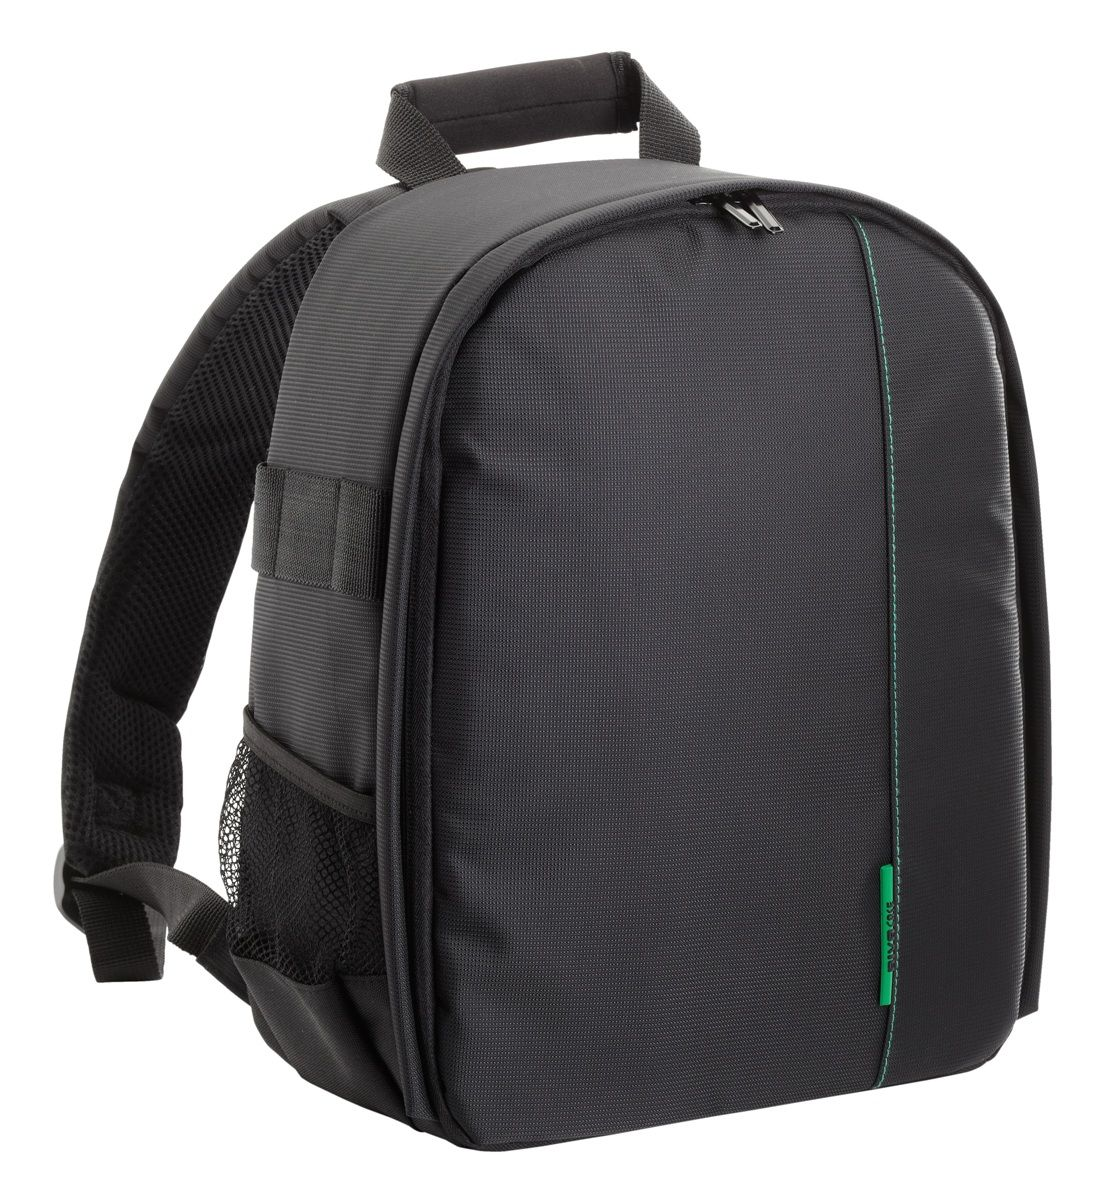 RIVACASE 7460 SLR Backpack, Black рюкзак для зеркальной фотокамеры rivacase 7630 slr case pro black сумка для зеркальной фотокамеры